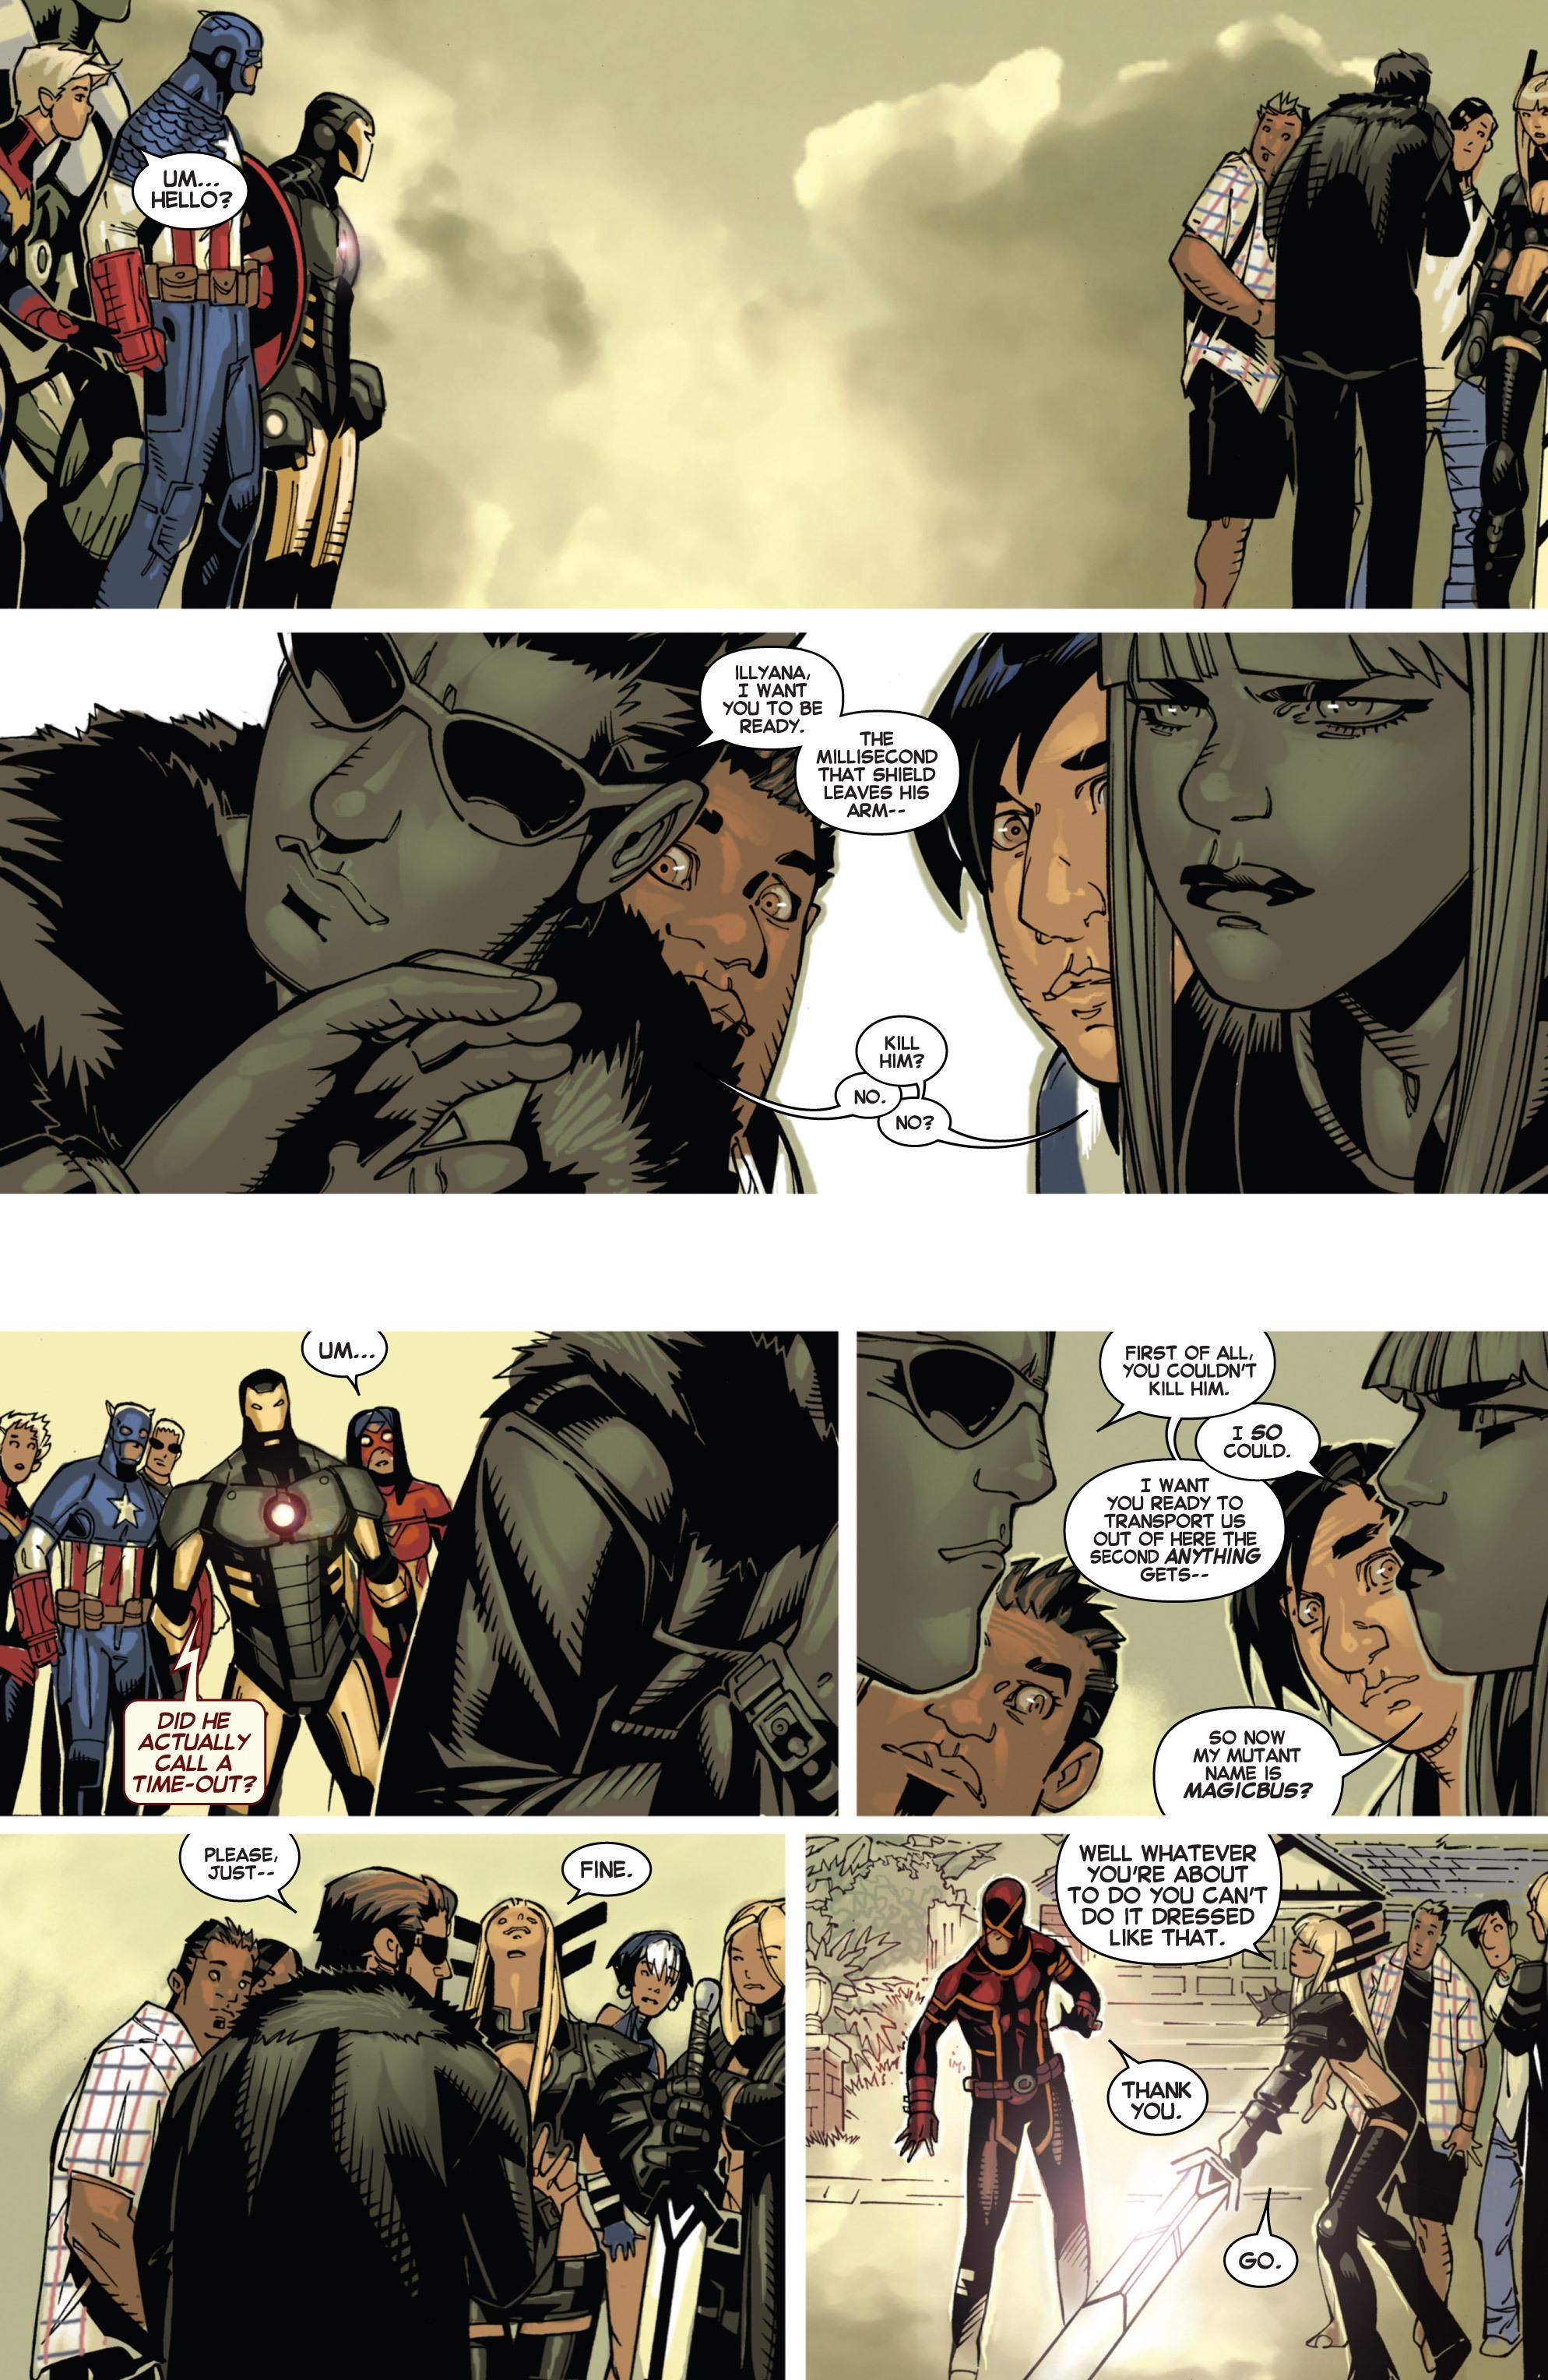 Read online Uncanny X-Men (2013) comic -  Issue # _TPB 1 - Revolution - 50